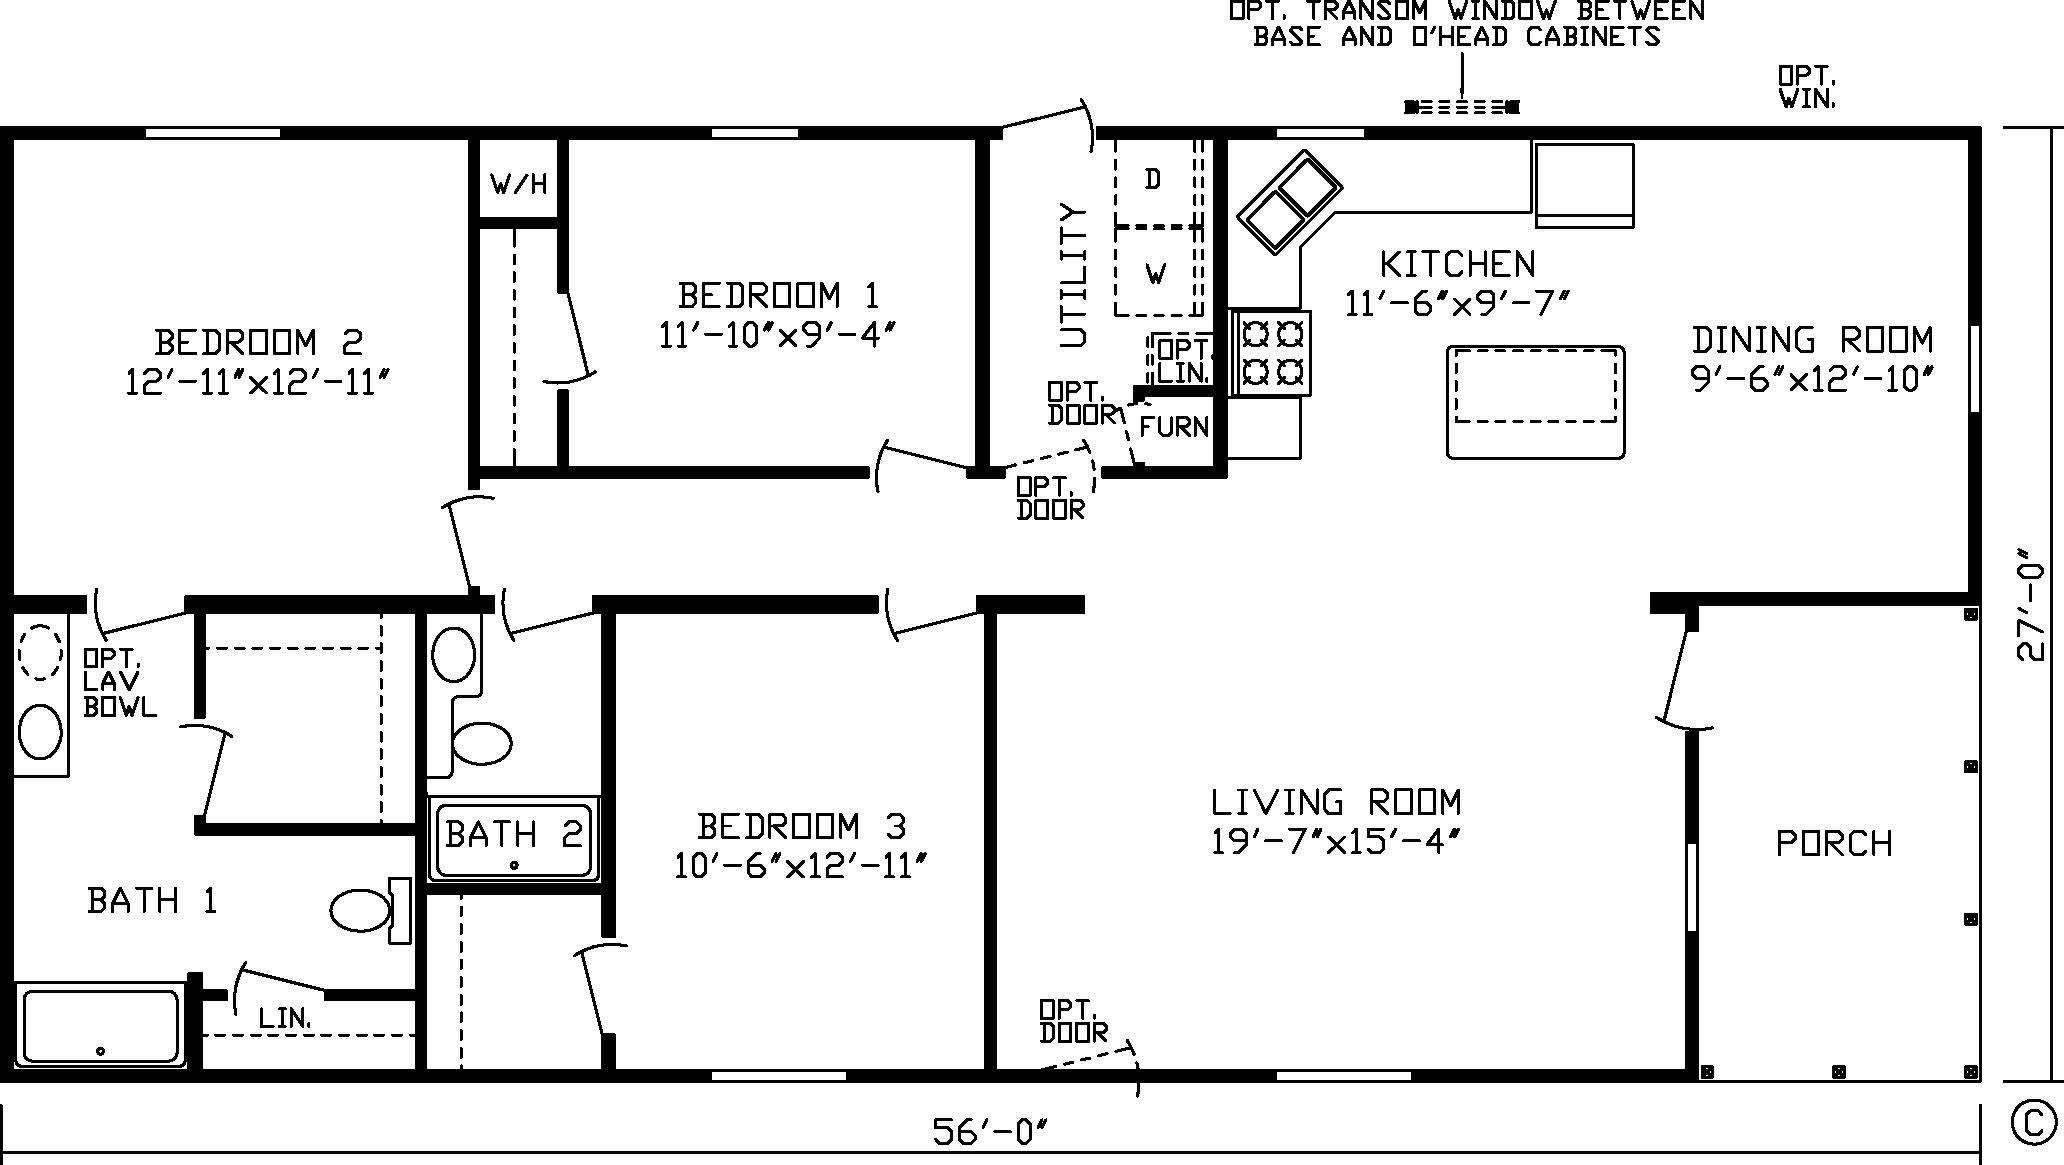 Hvac Layout Drawings Modern House